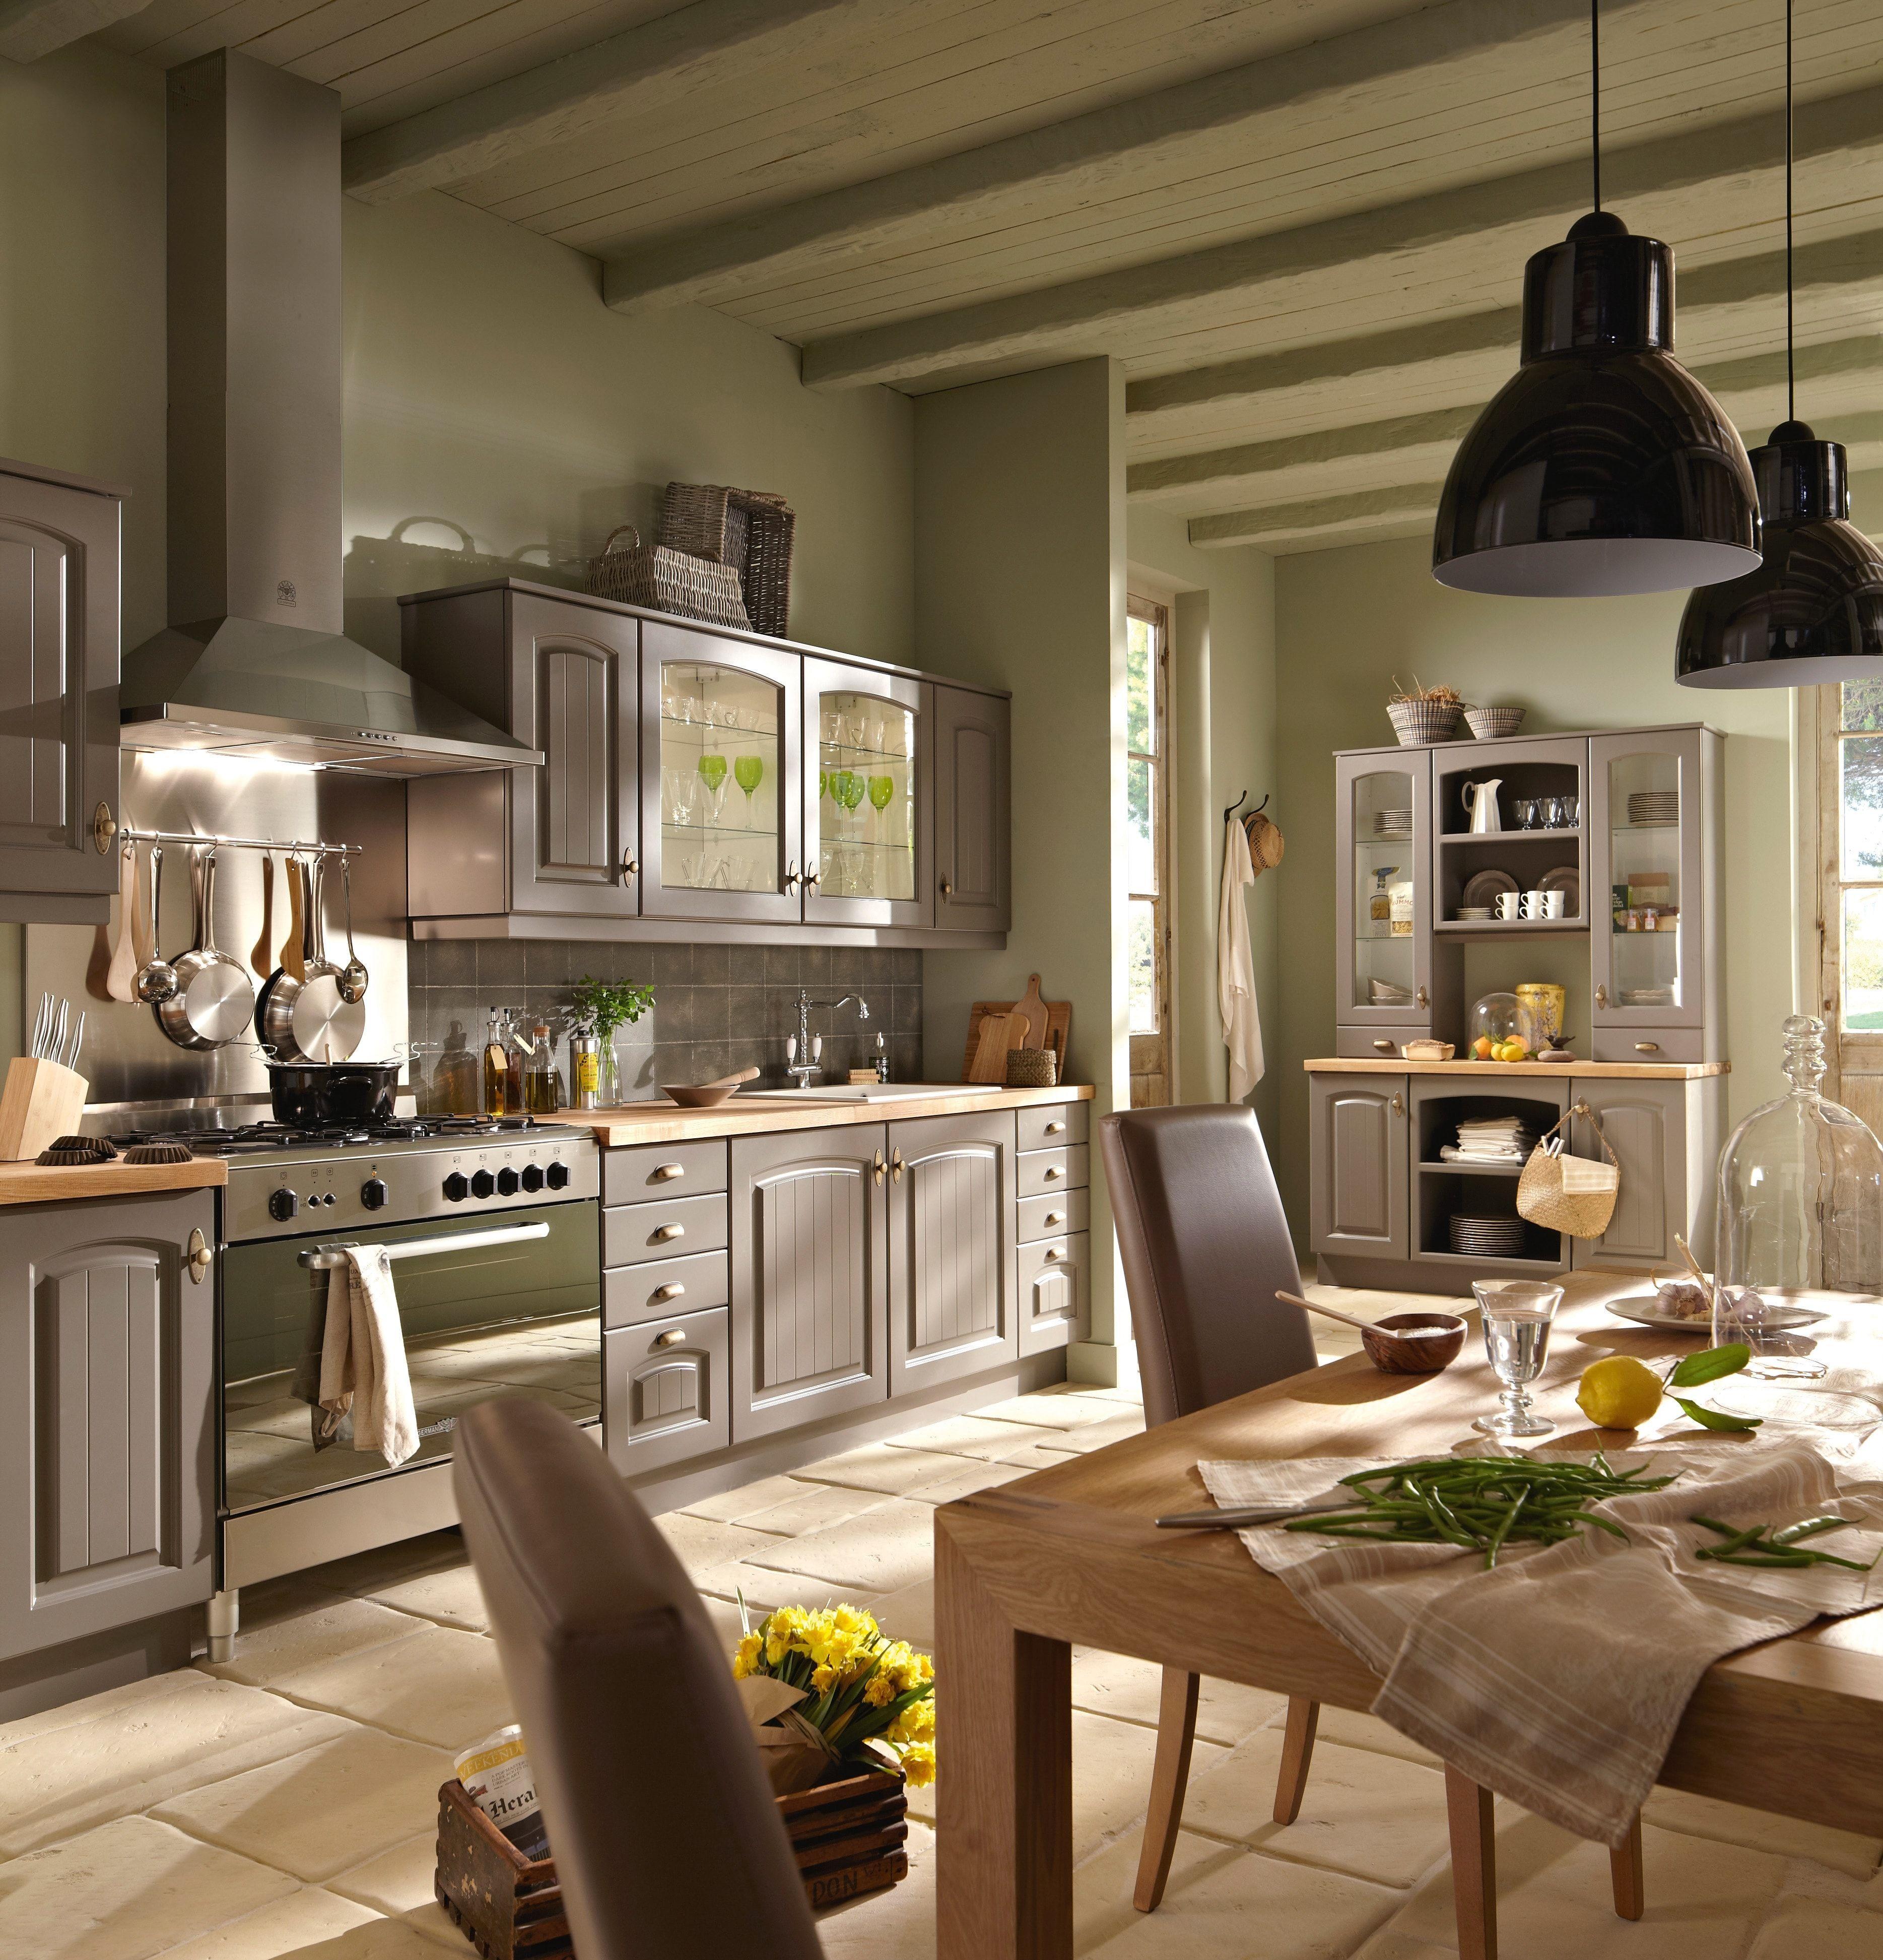 Pin Von Ebony Stark Auf Cuisine Kitchen And Style Kuchen Mobel Rustikale Kuche Kuche